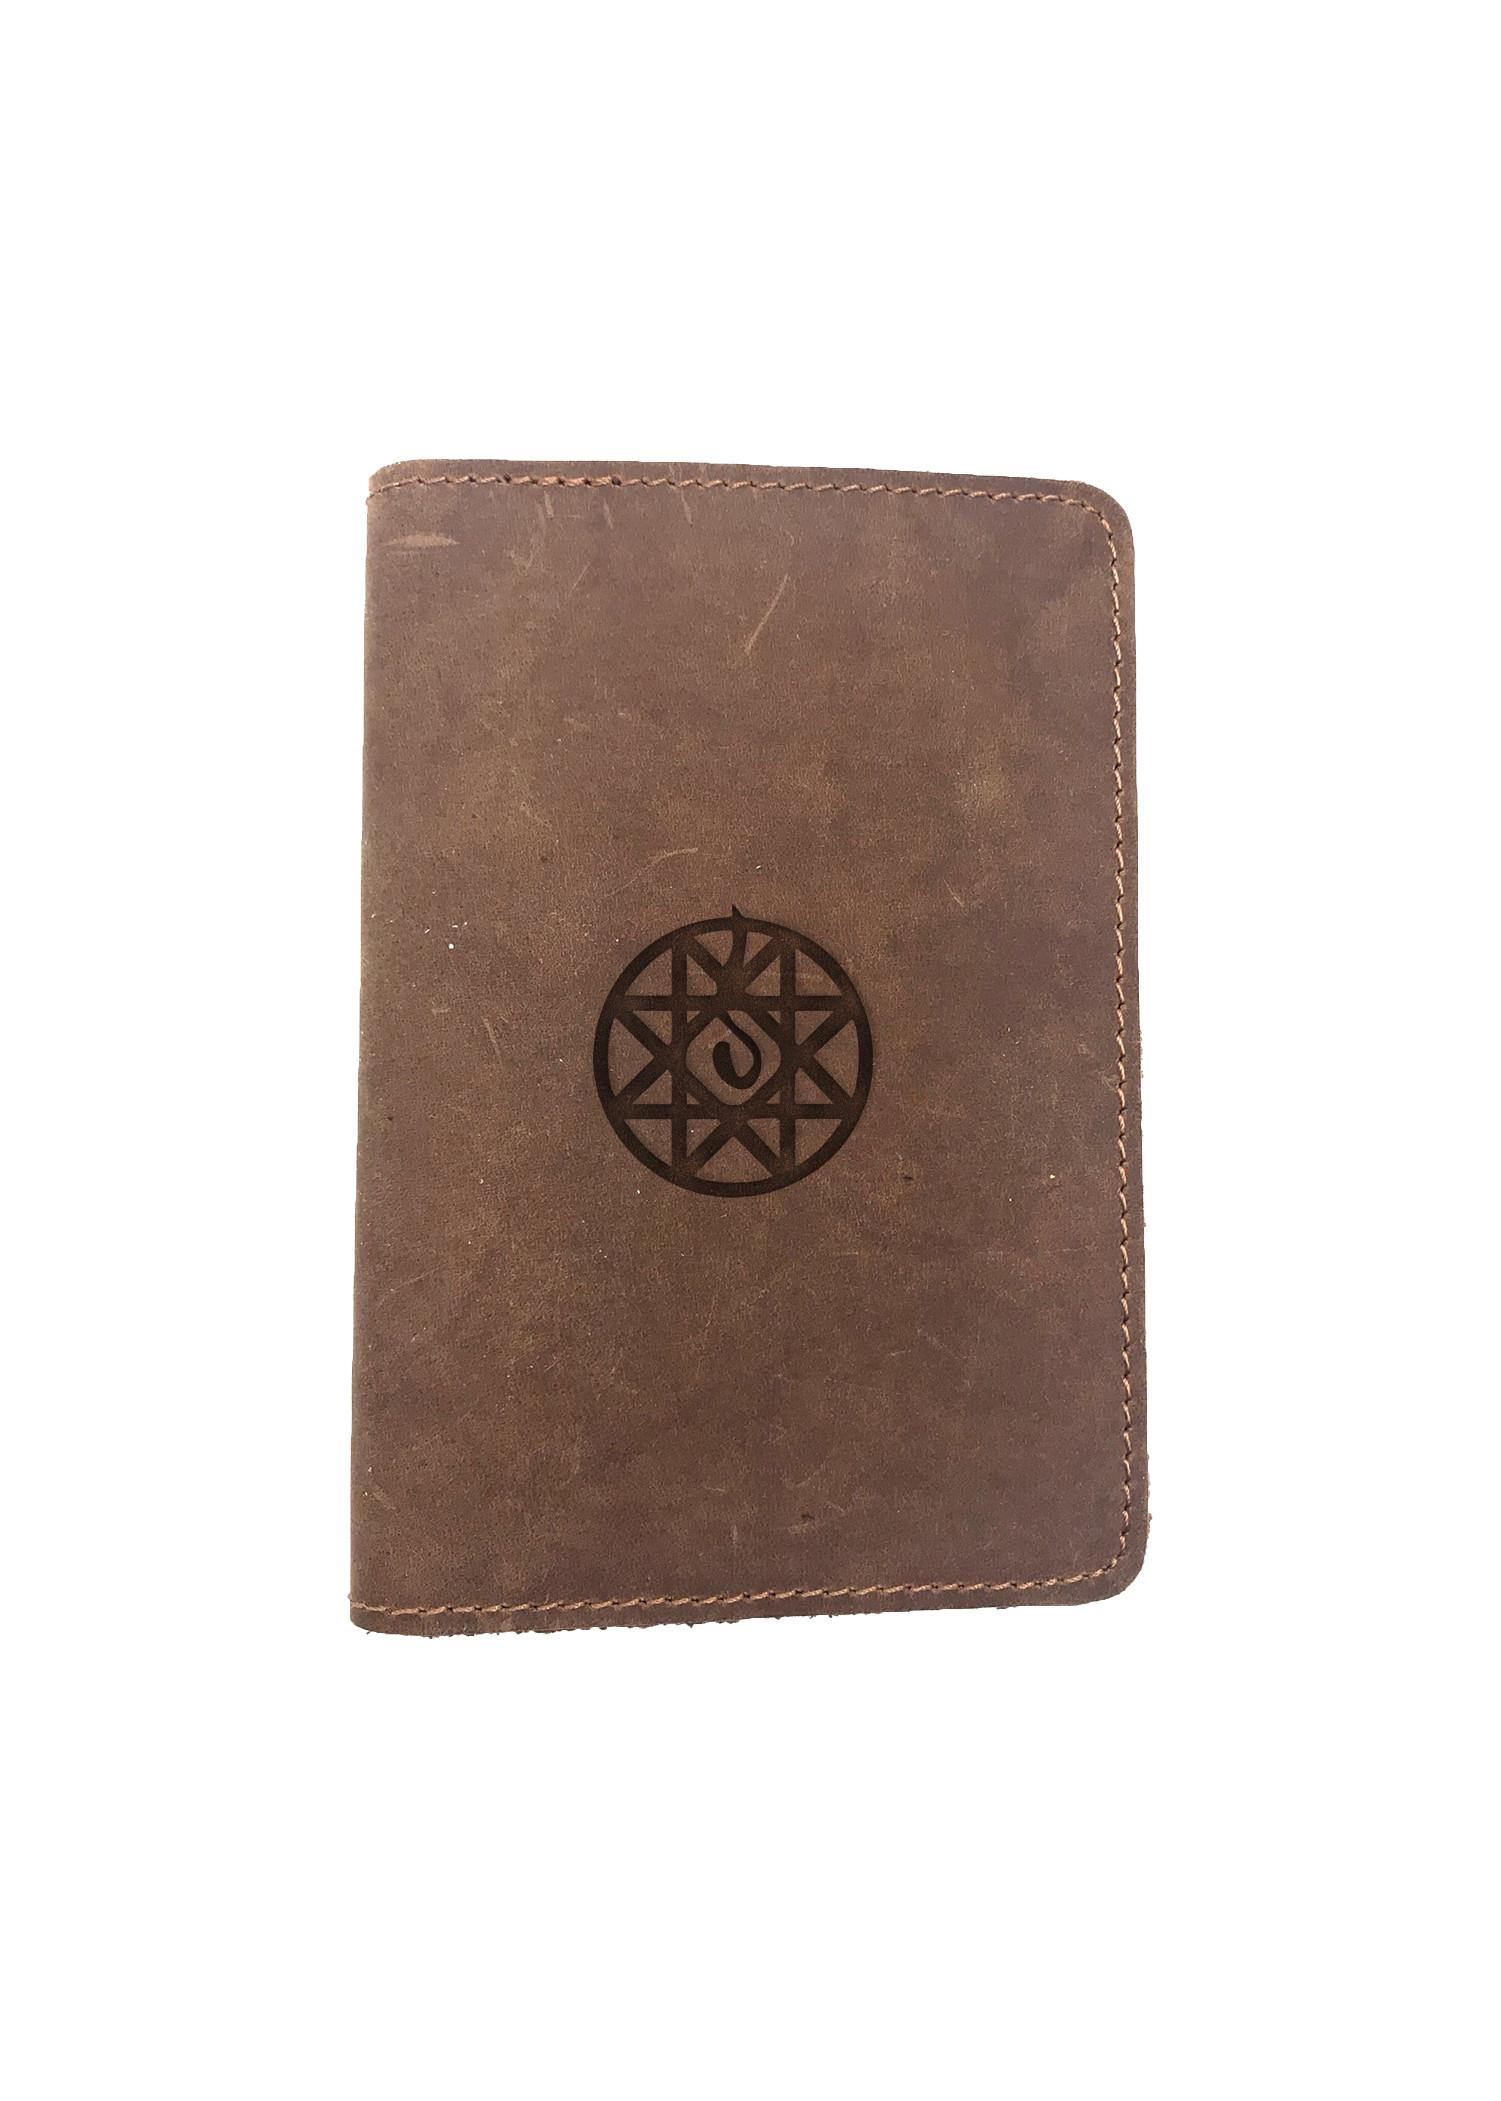 Passport Cover Bao Da Hộ Chiếu Da Sáp Khắc Hình Hình FULL METAL ALCHEMIST BLOOD SEAL (BROWN)